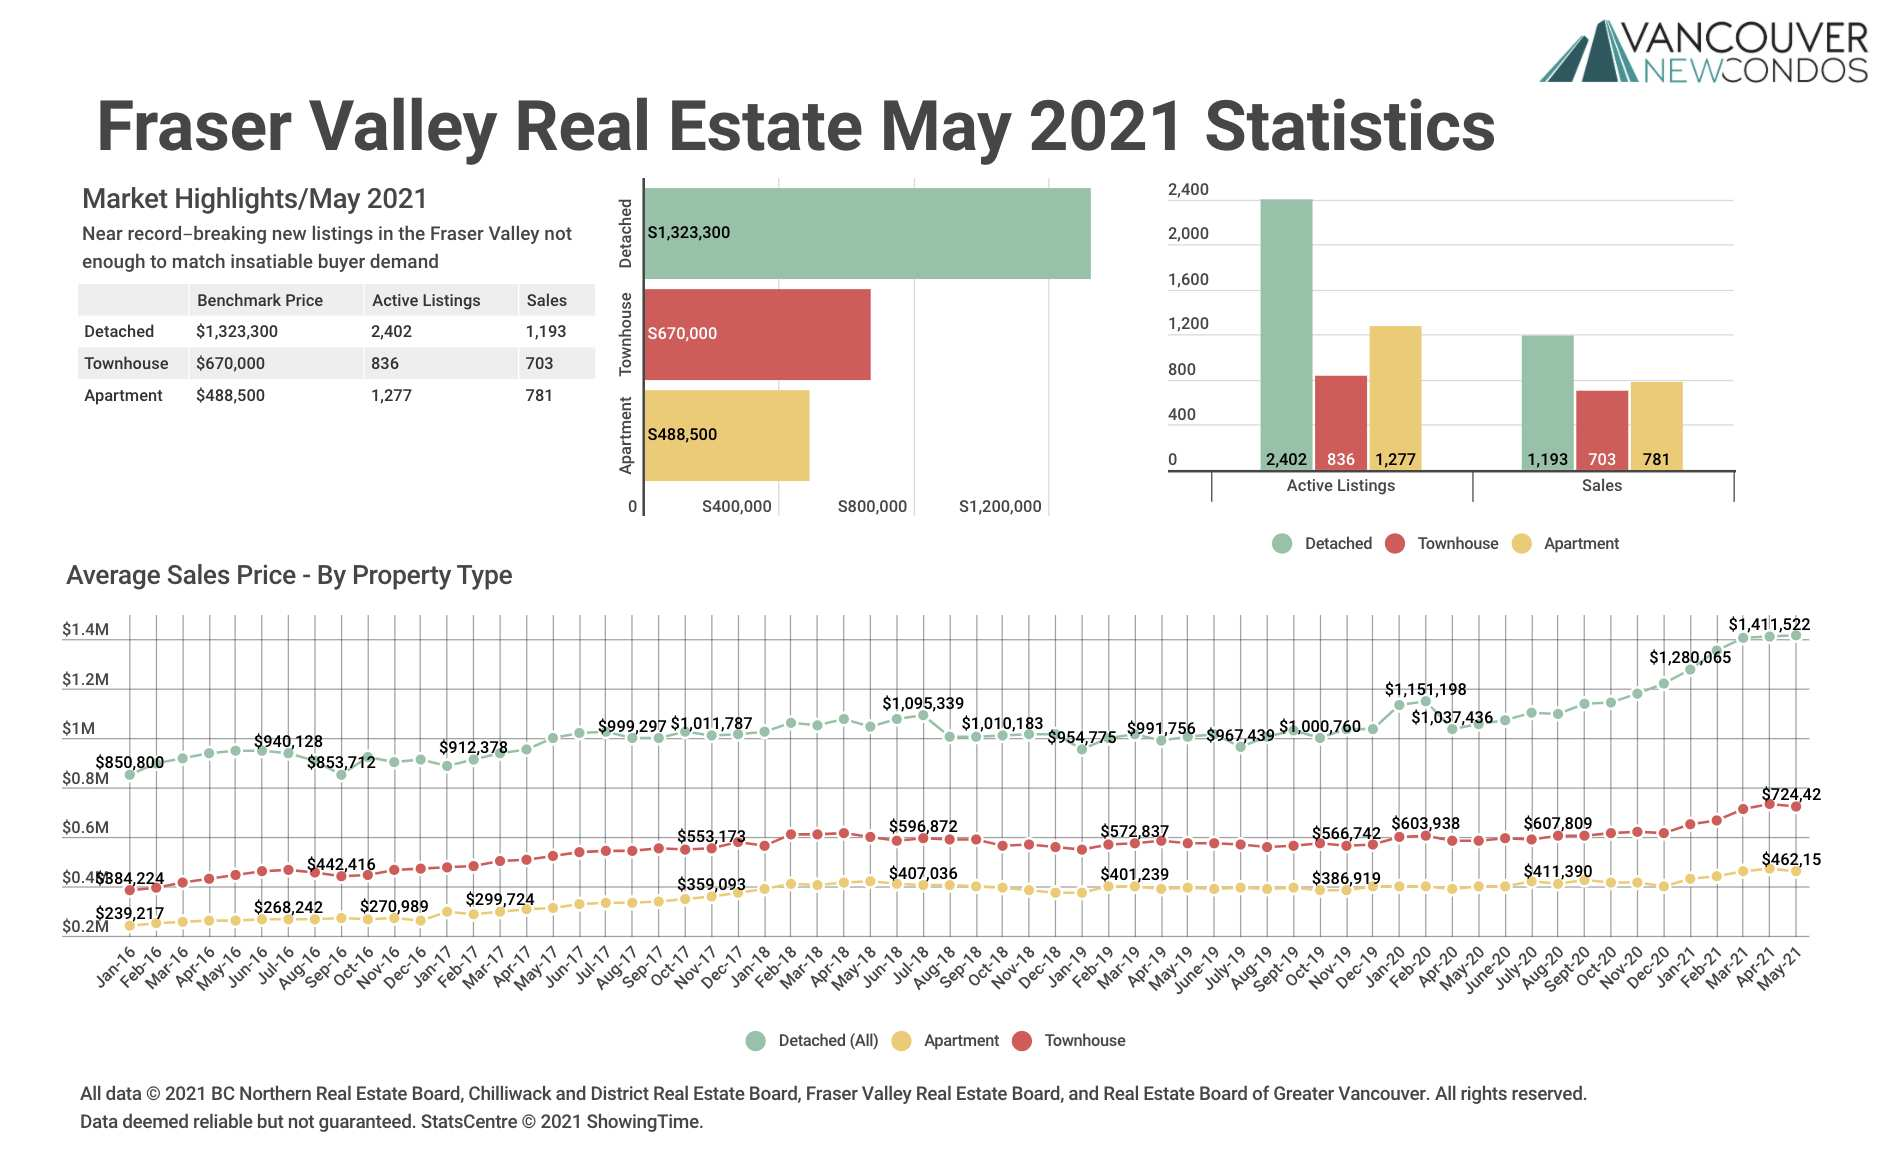 FVREB May 21 Stats Graph